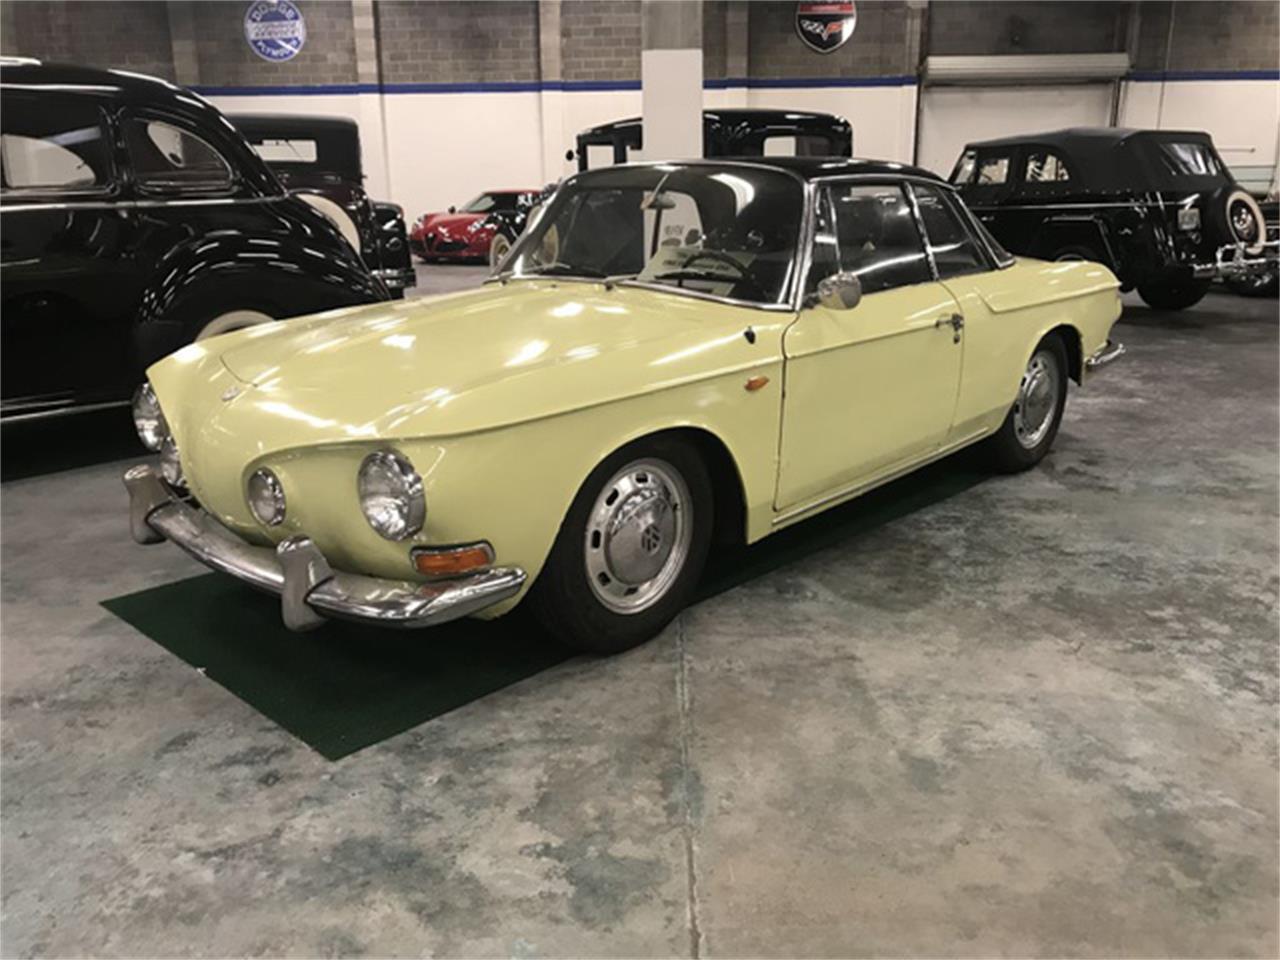 1966 Volkswagen Karmann Ghia (CC-1387002) for sale in Online, Mississippi